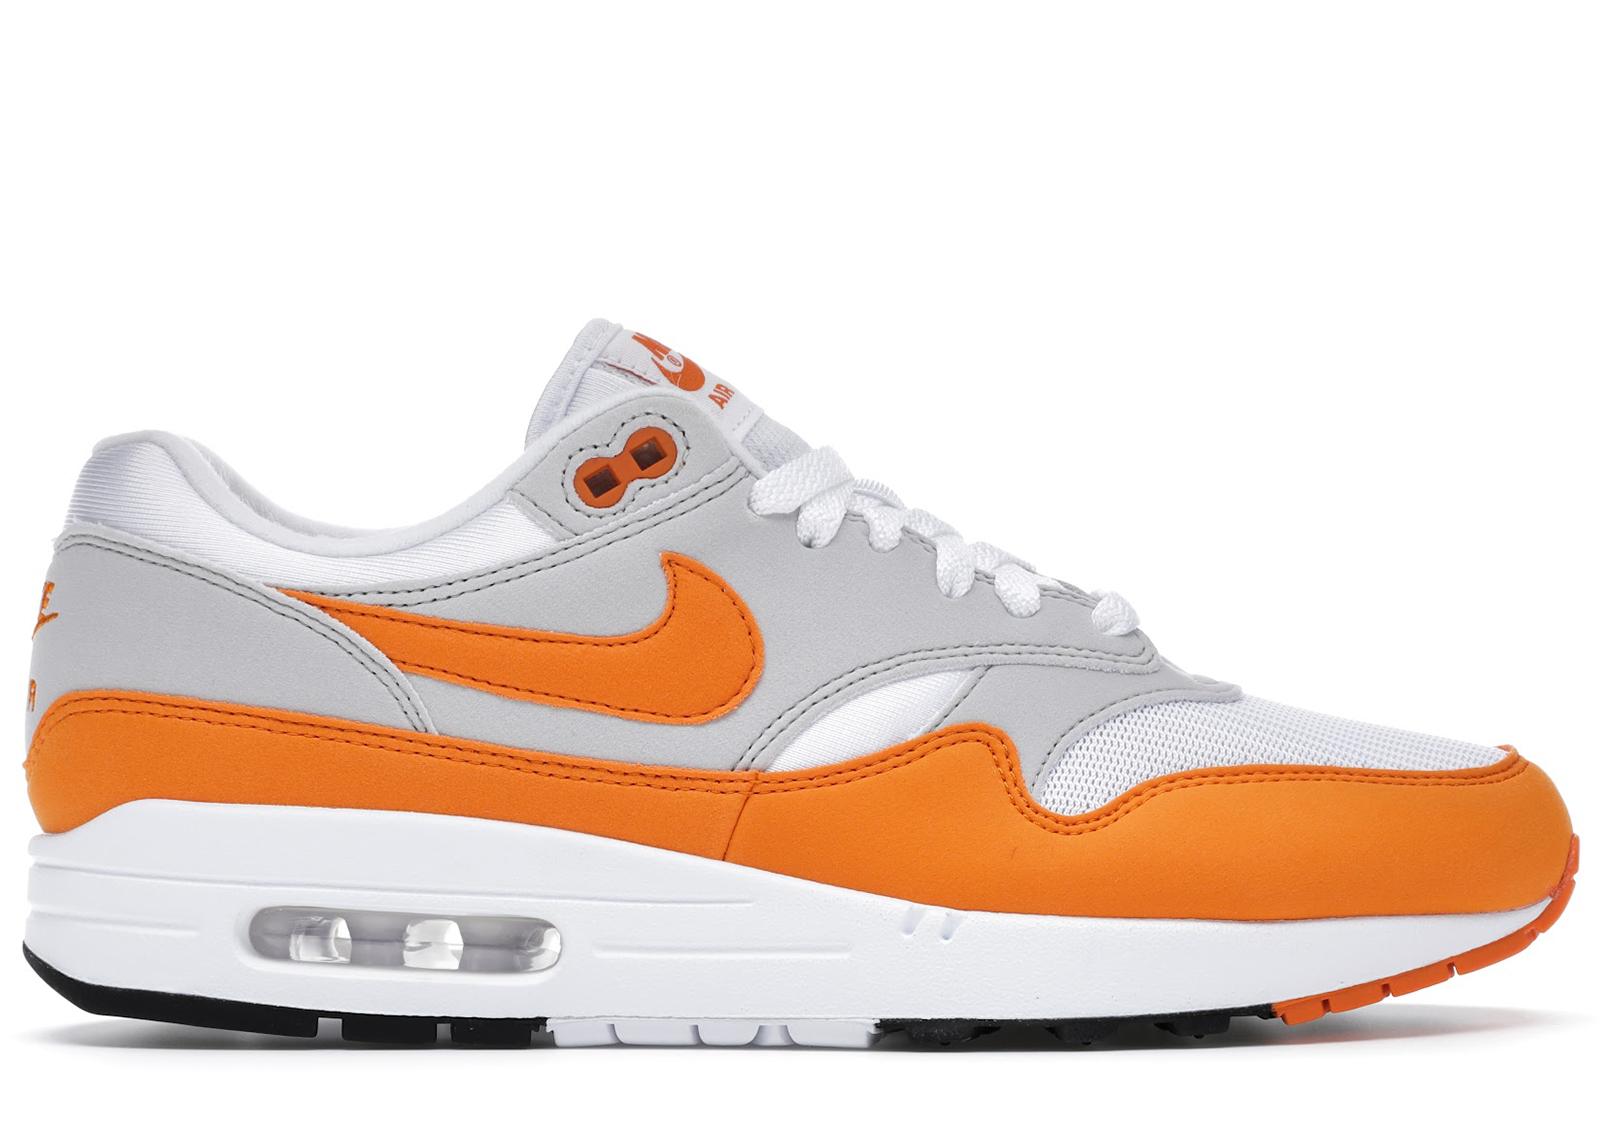 Nike Air Max 1 Anniversary Orange (2020